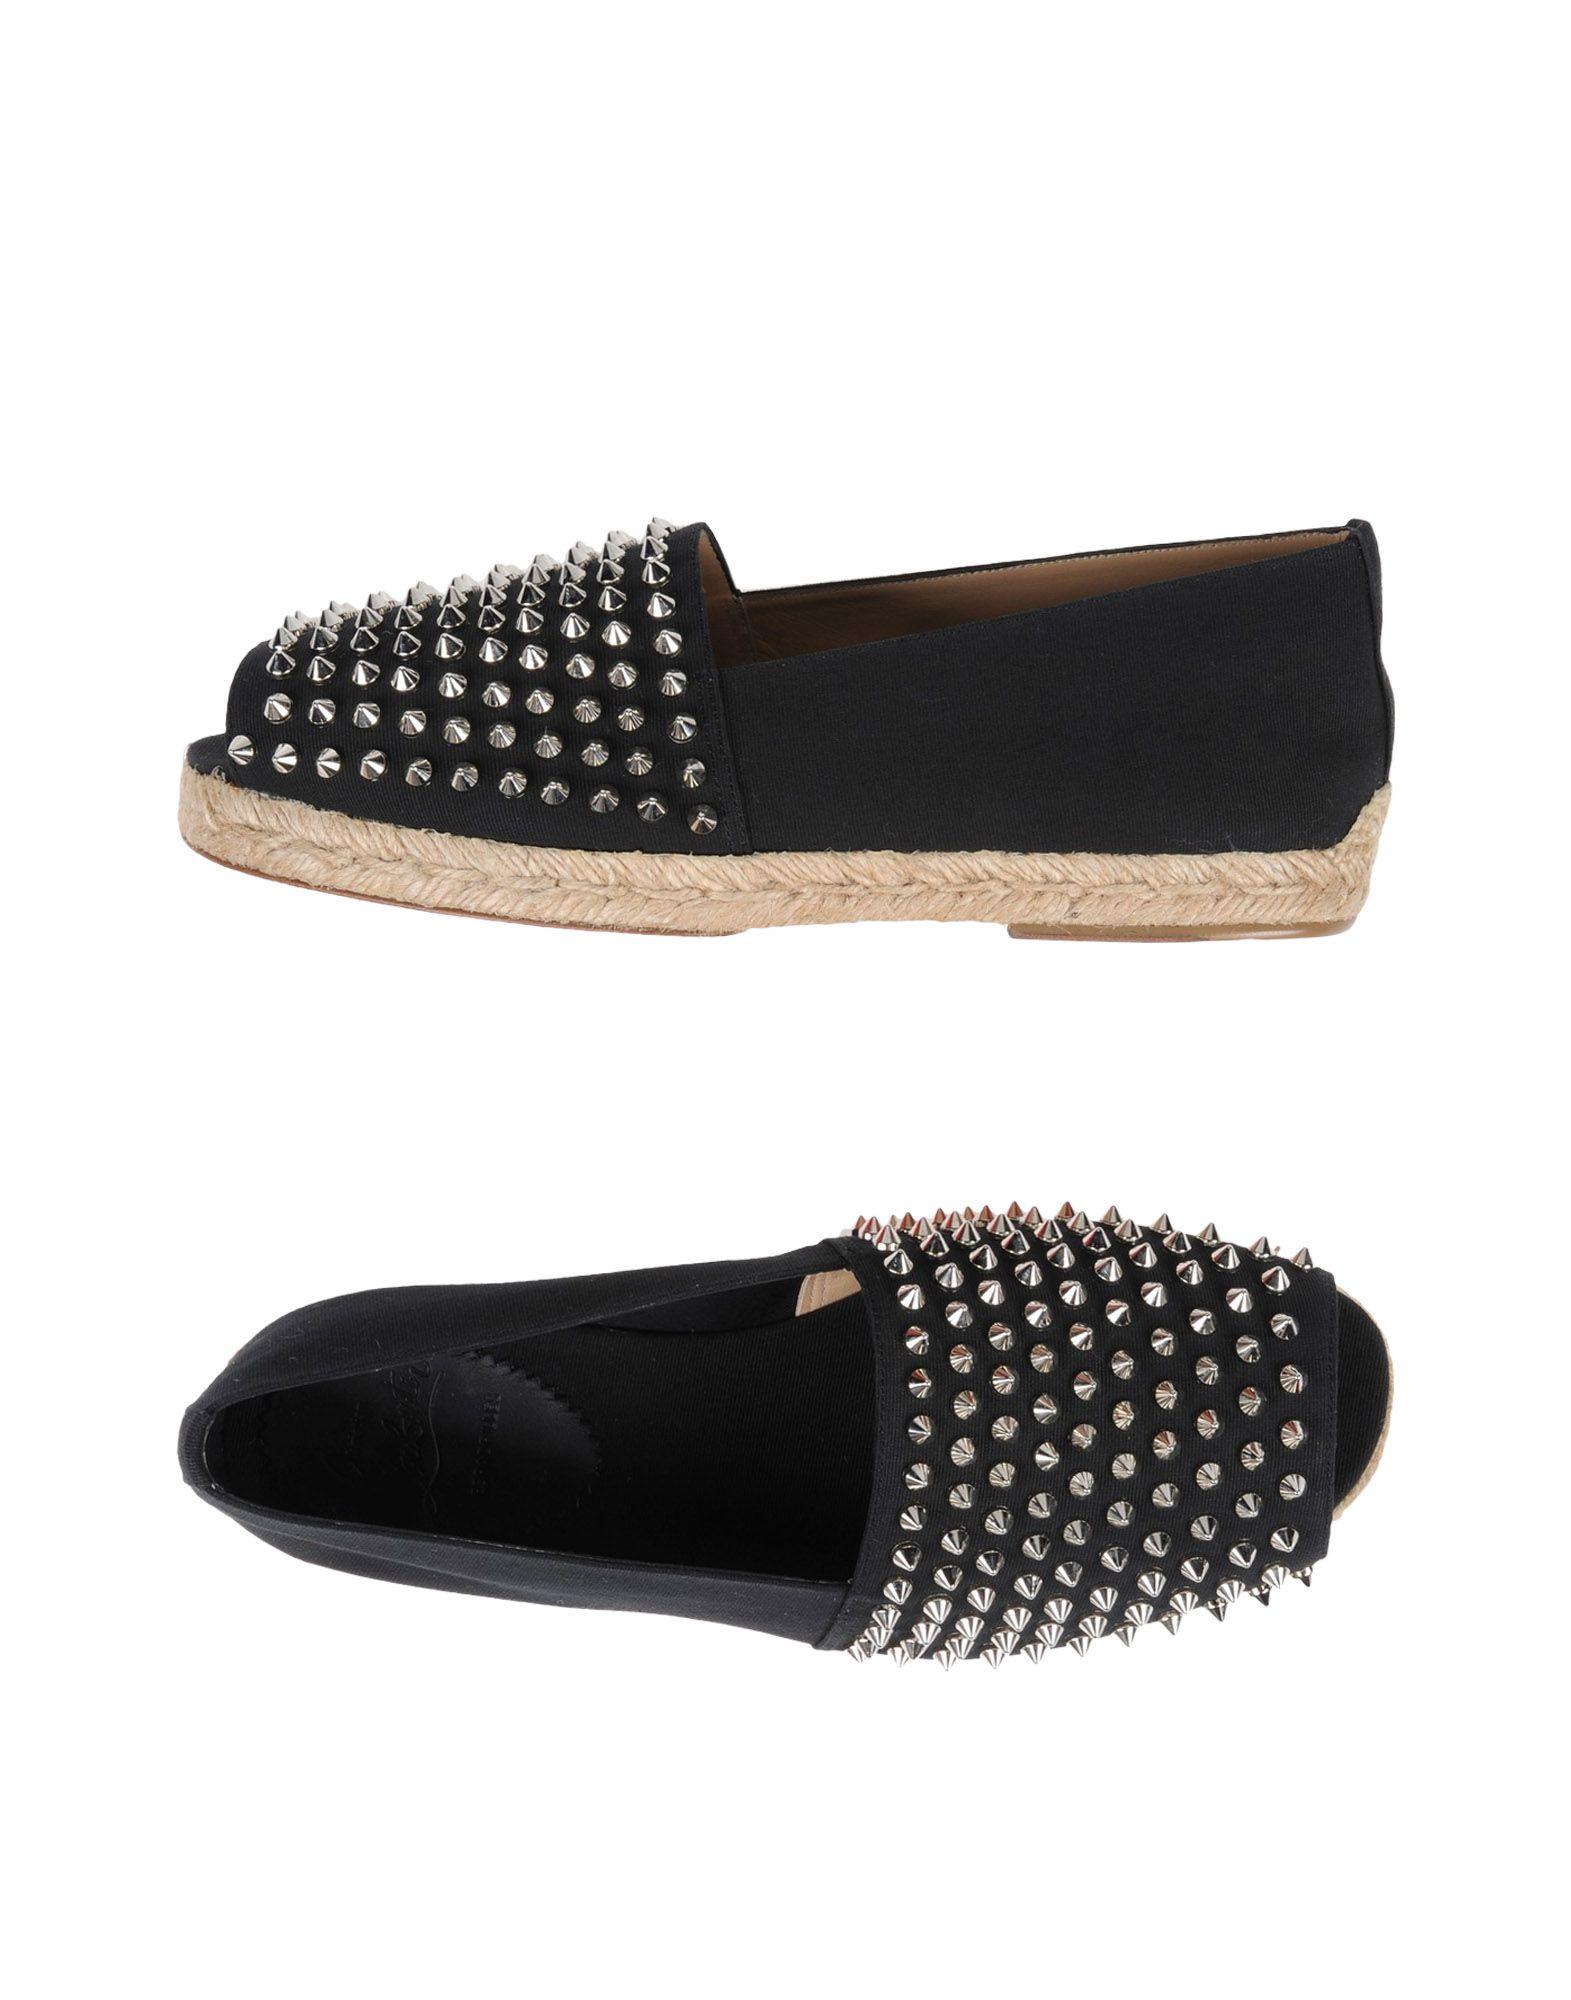 bas prix a157d 16bd3 CHRISTIAN LOUBOUTIN Espadrilles - Footwear | YOOX.COM